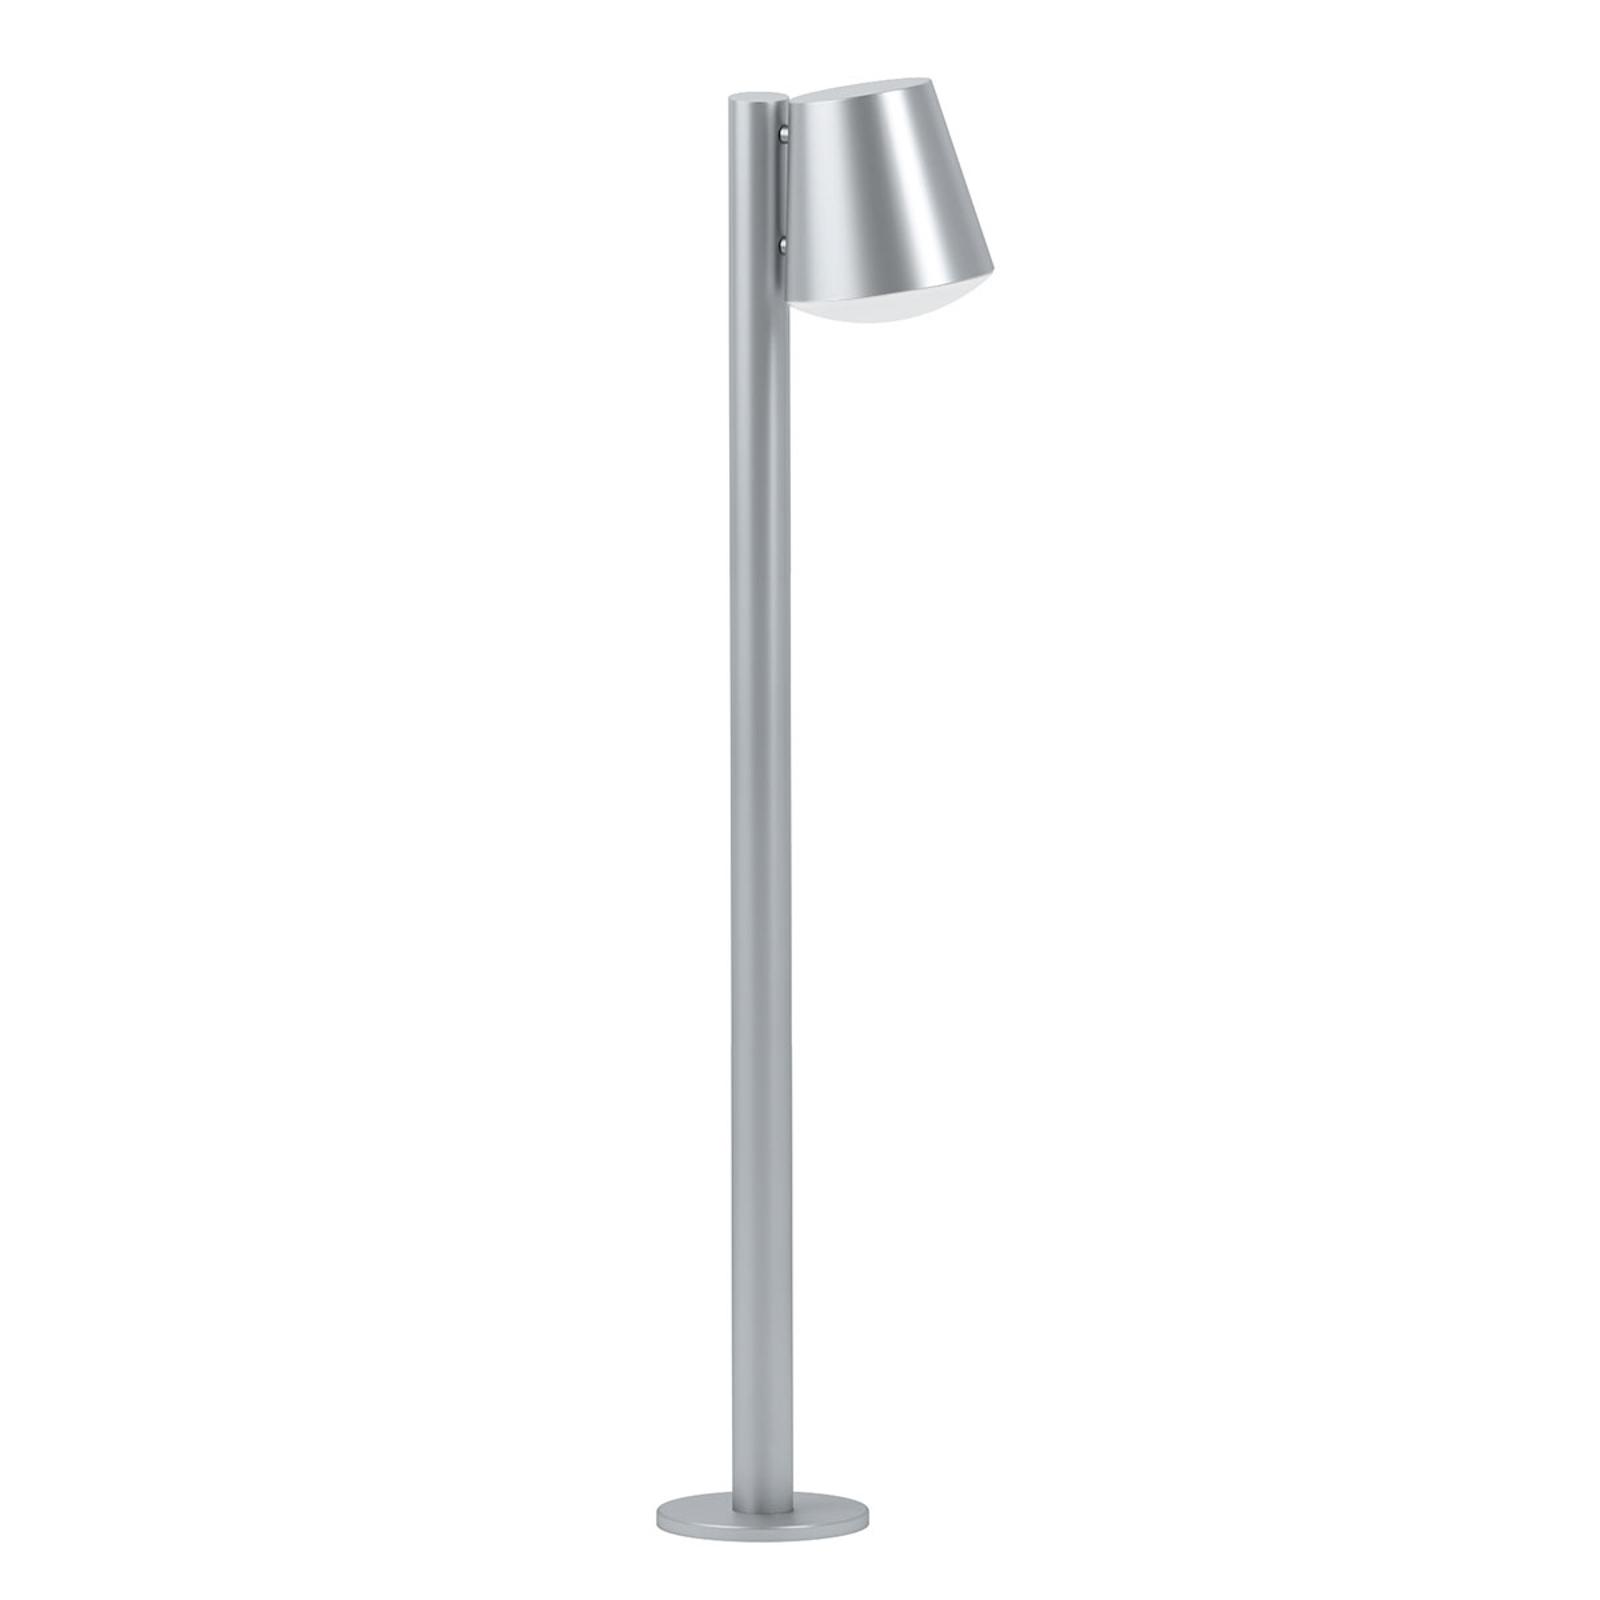 EGLOconnect Caldiero-C LEDgånglampa rostfritt stål